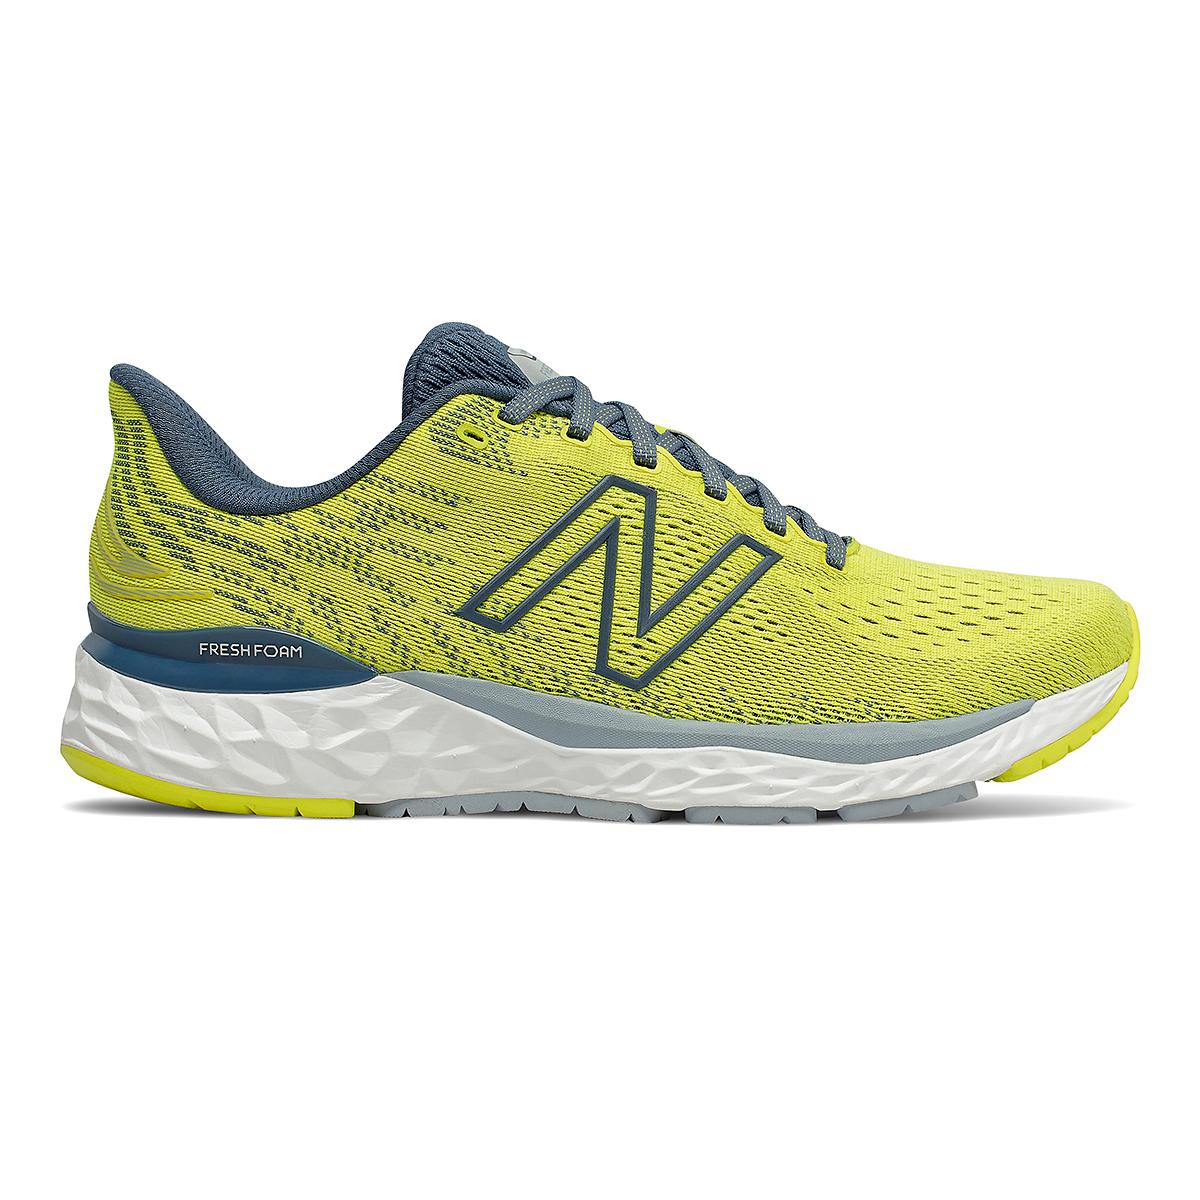 Men's New Balance Fresh Foam 880v11 Running Shoe - Color: Sulphur Yellow/Deep Ocean Grey - Size: 7 - Width: Wide, Sulphur Yellow/Deep Ocean Grey, large, image 1